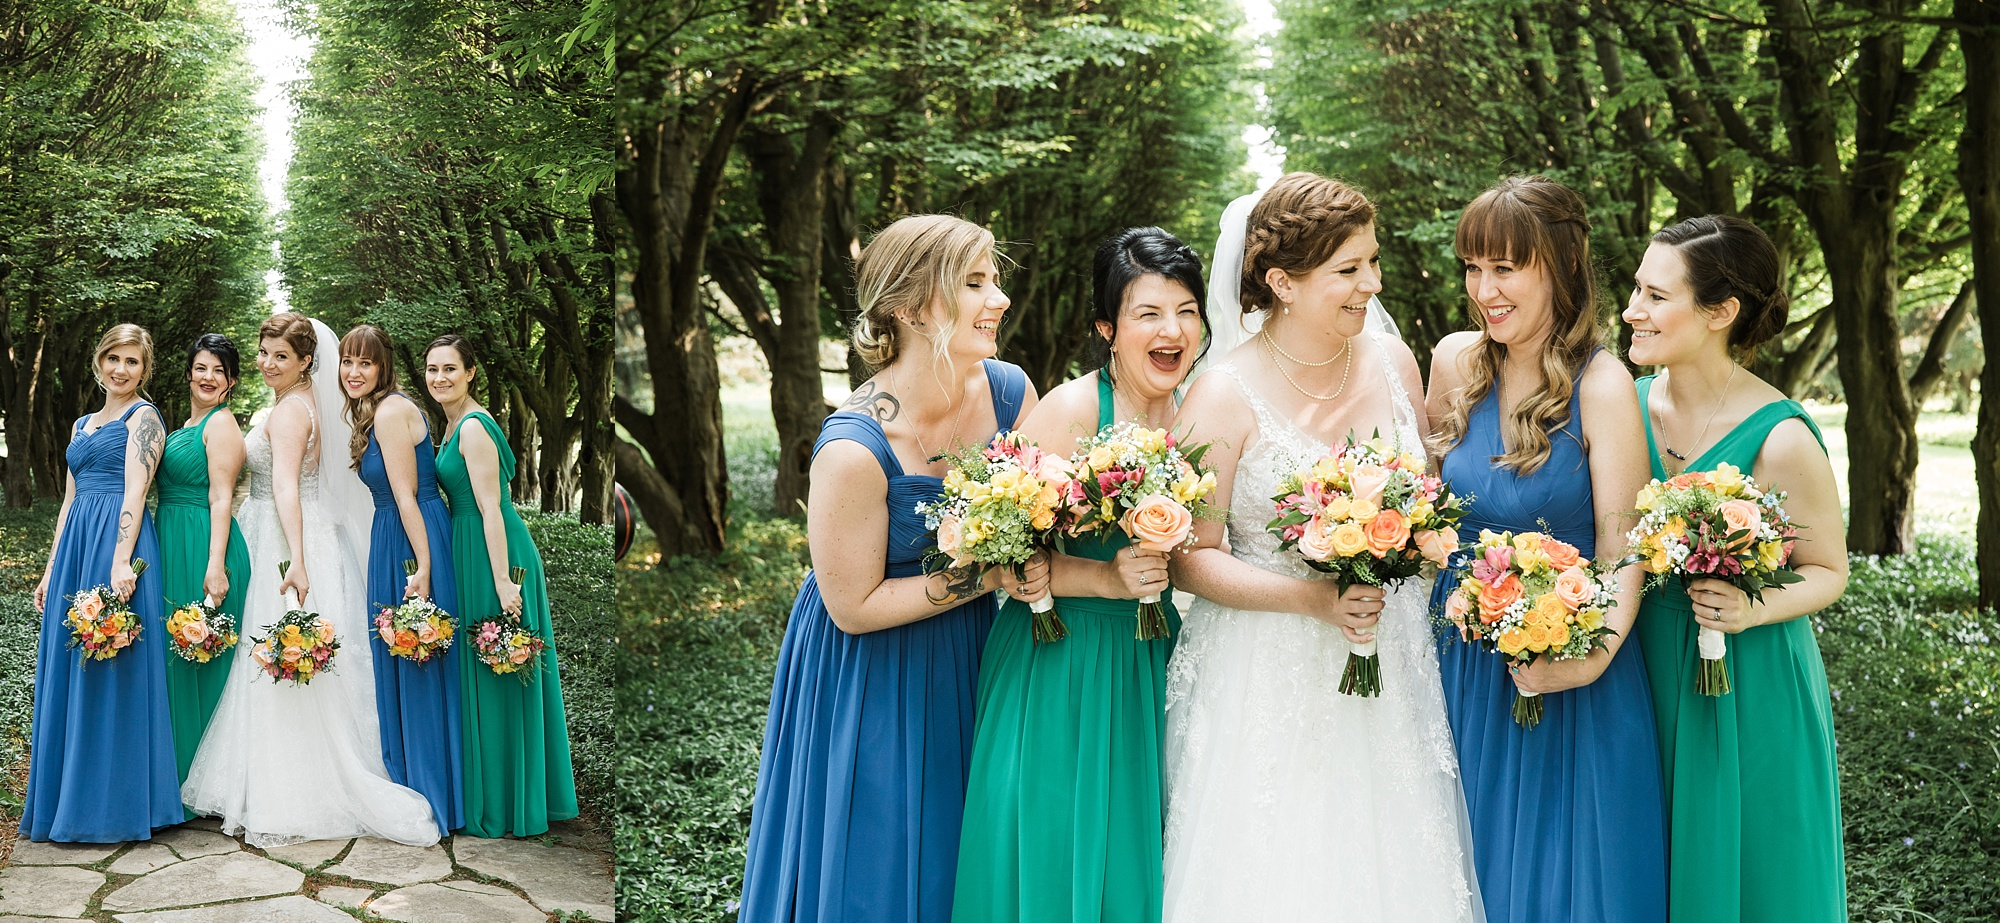 niagarafalls-weddingphotography_0033.jpg